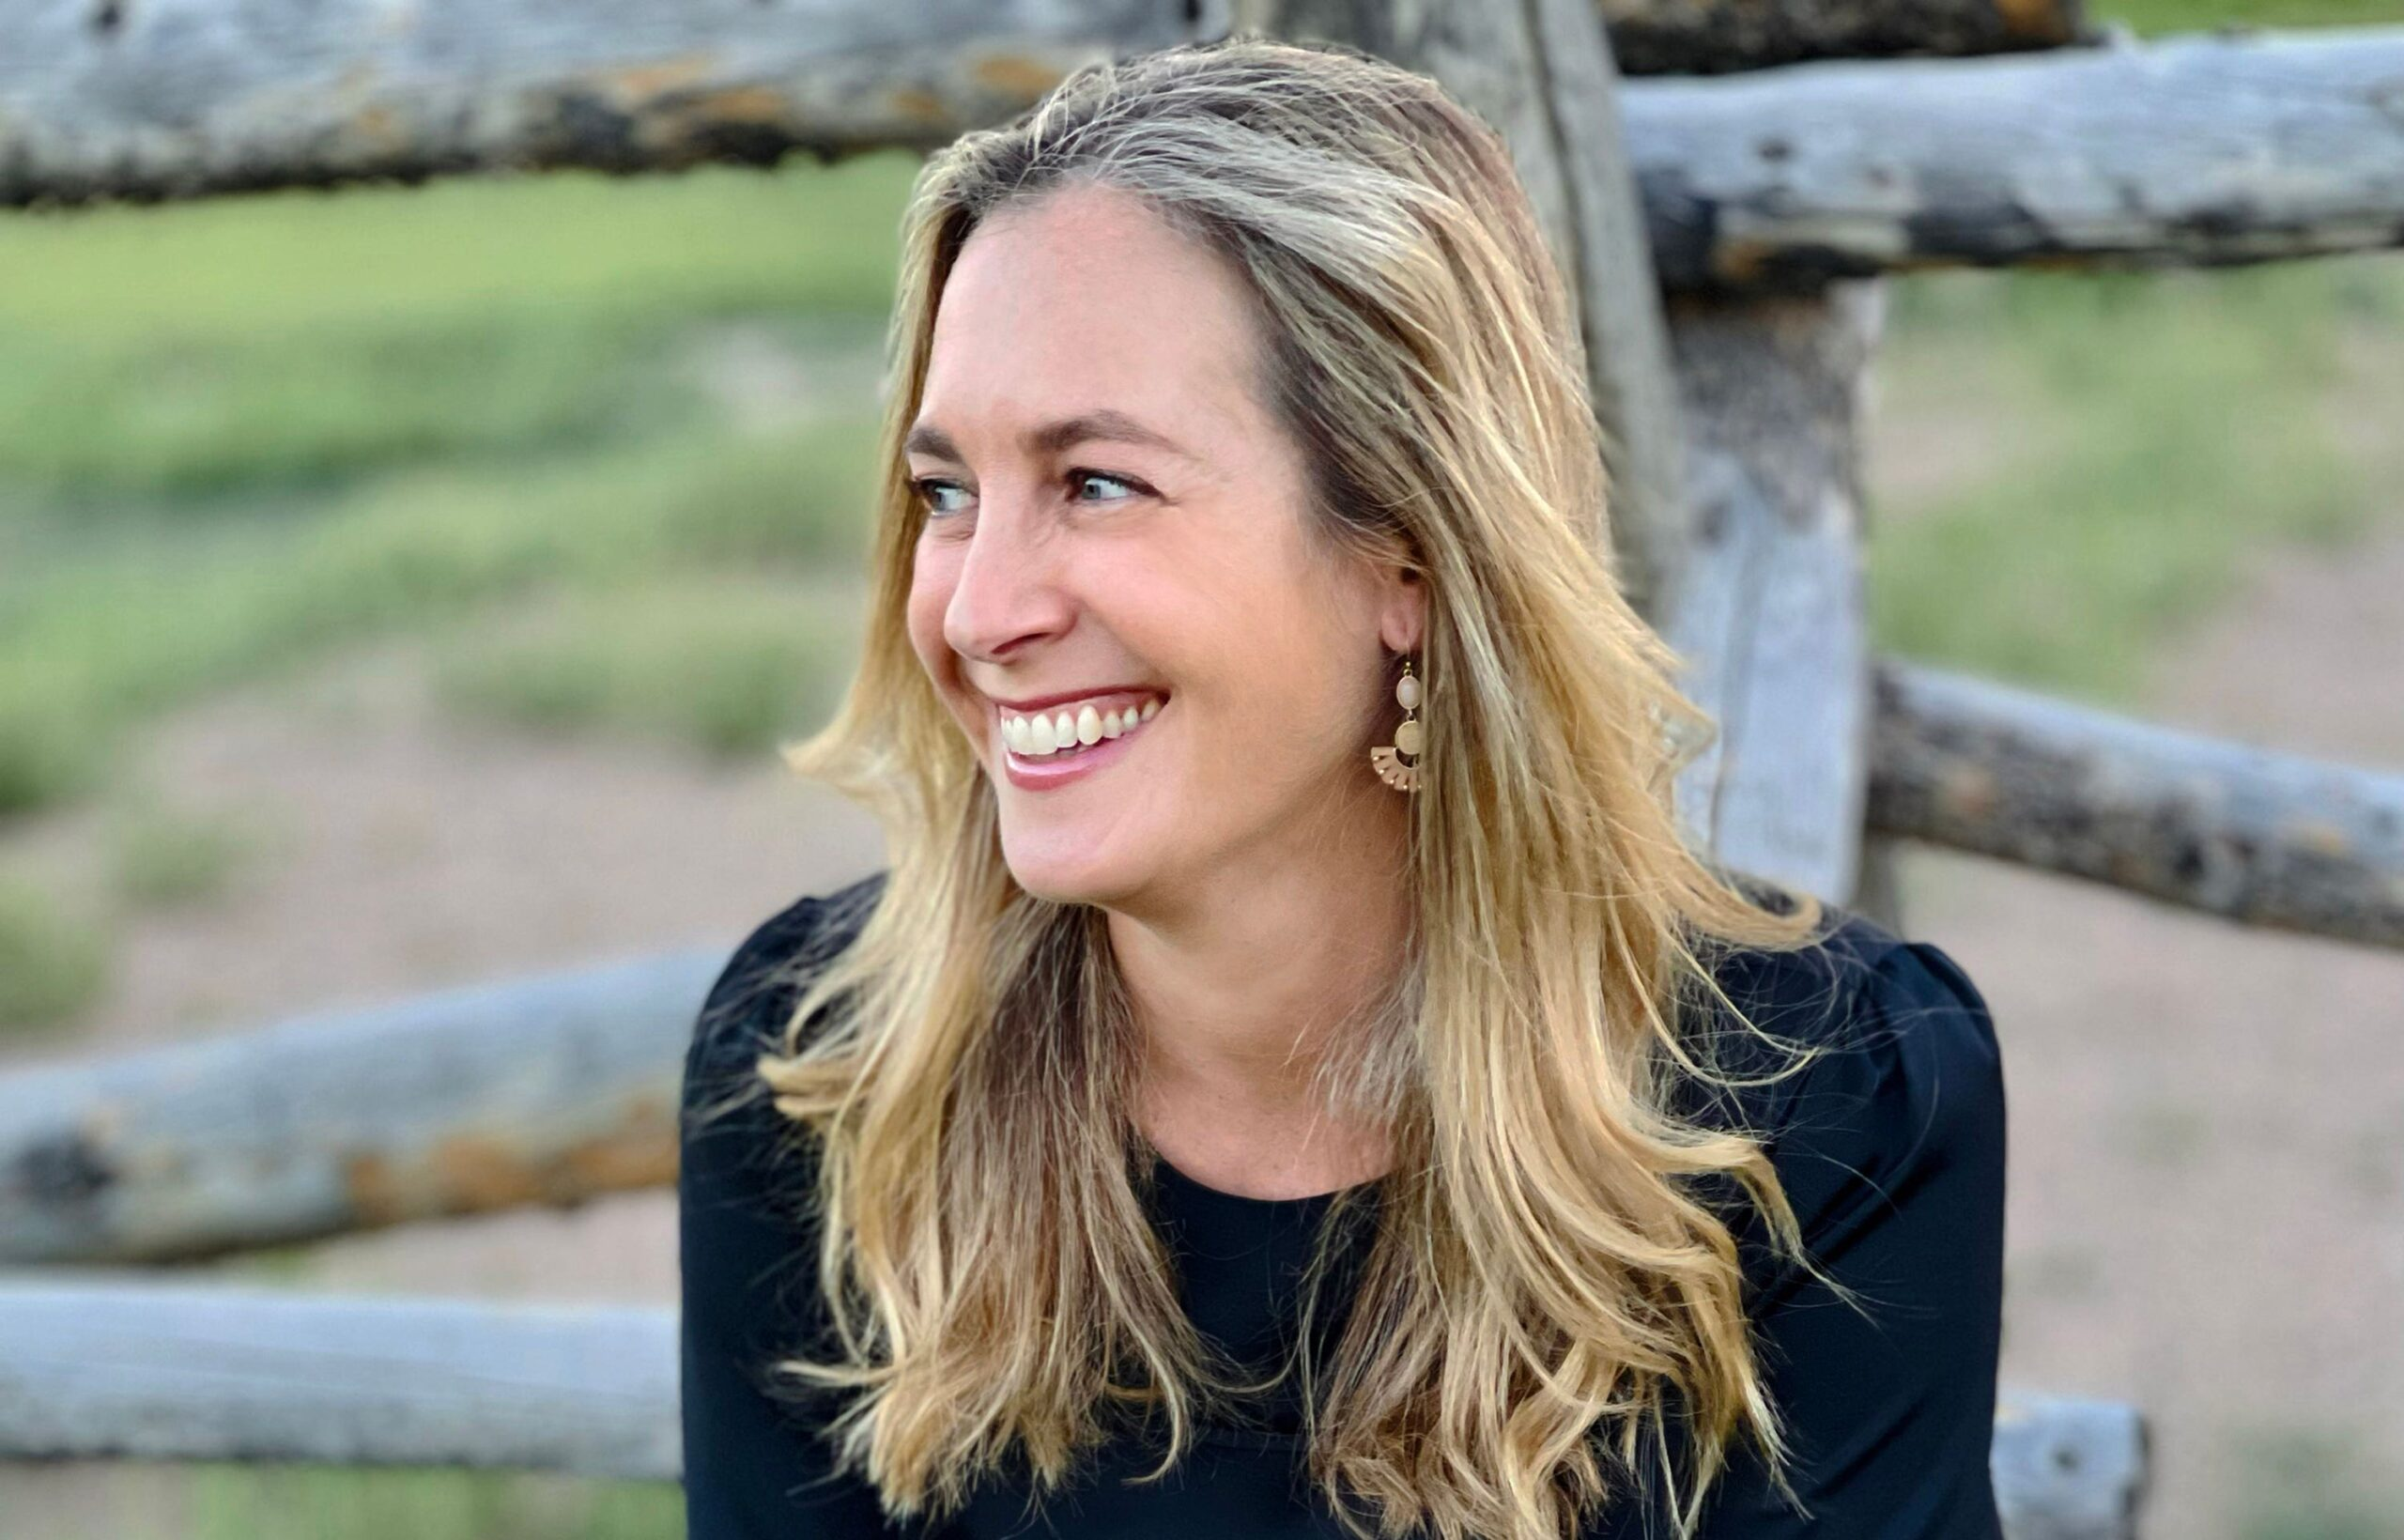 Author Lauren Weisberger scaled